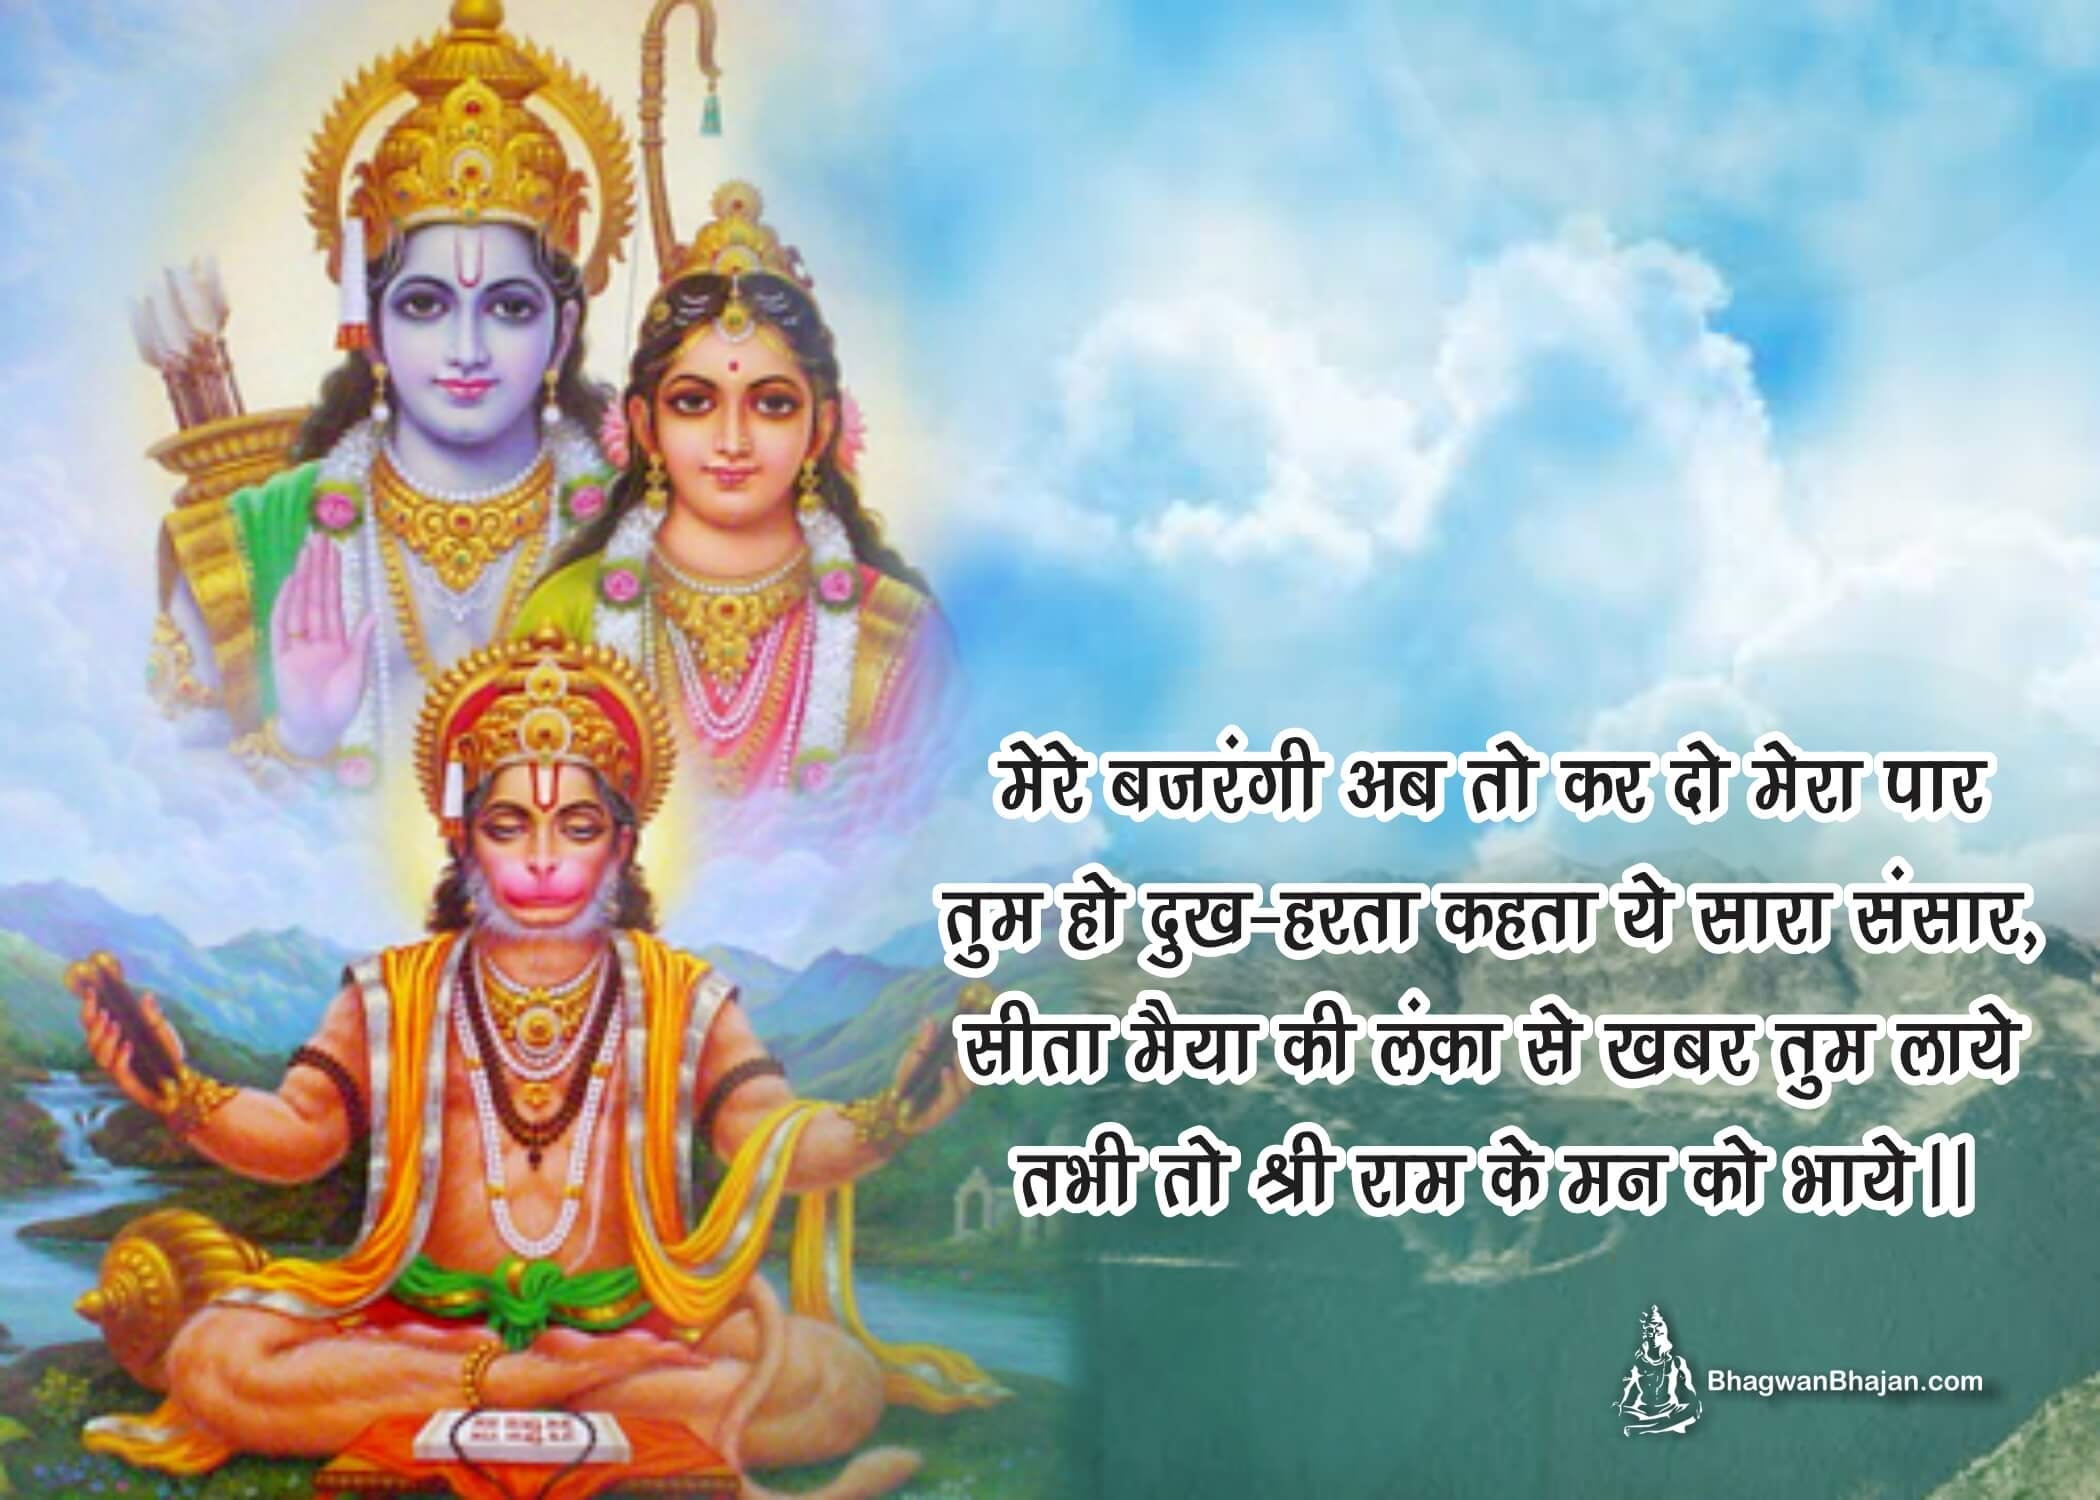 Lord Hanuman Whatsapp Status Image